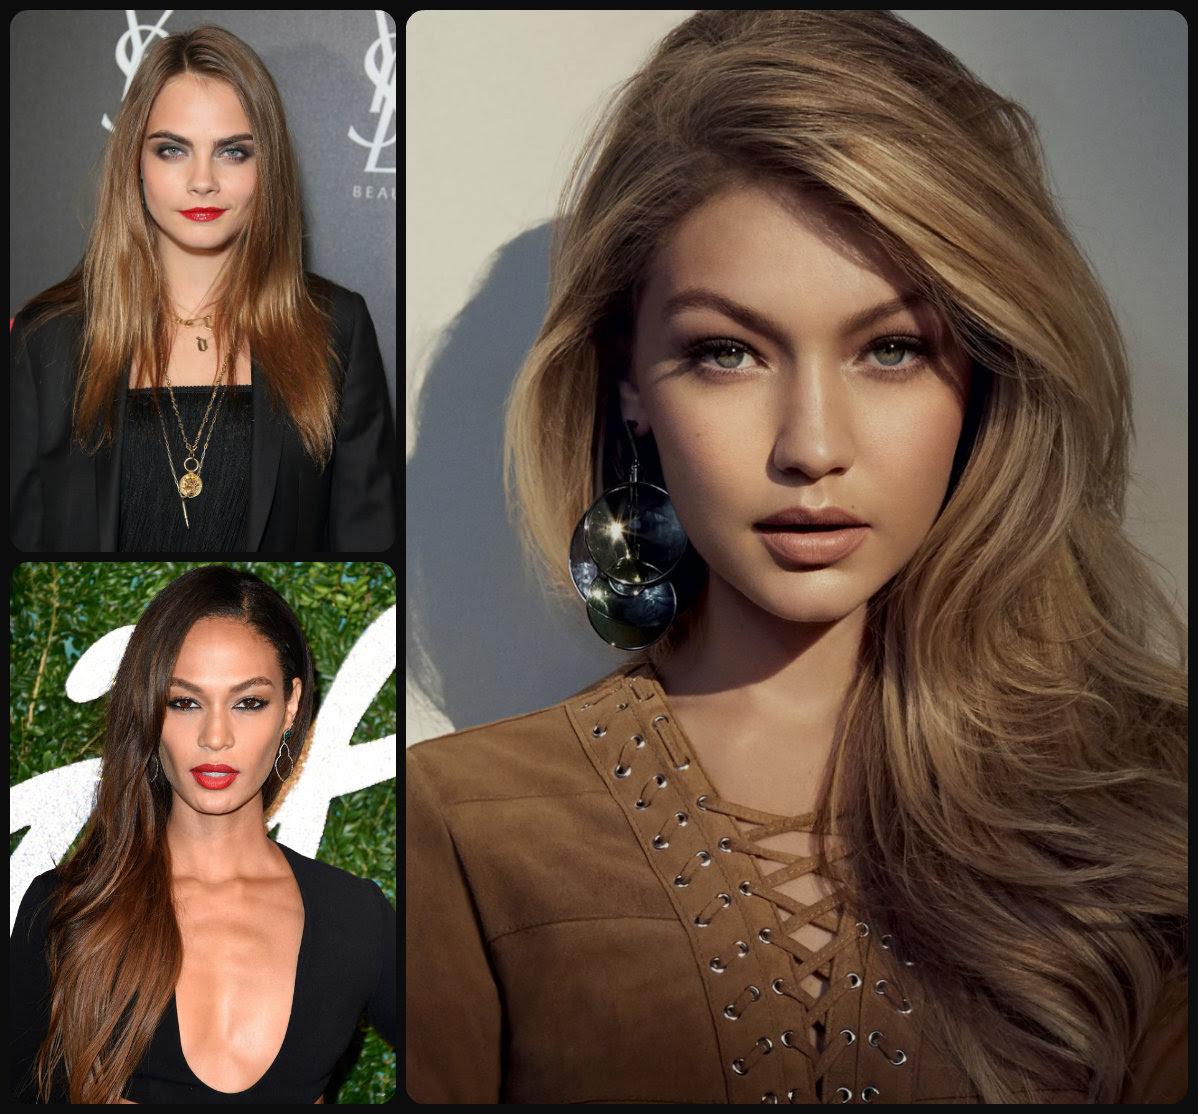 Best Hair Colors 2016 Winter Hairstyles 2017 Hair Colors And Haircutshairstyles 2016 Hair Colors And Haircuts